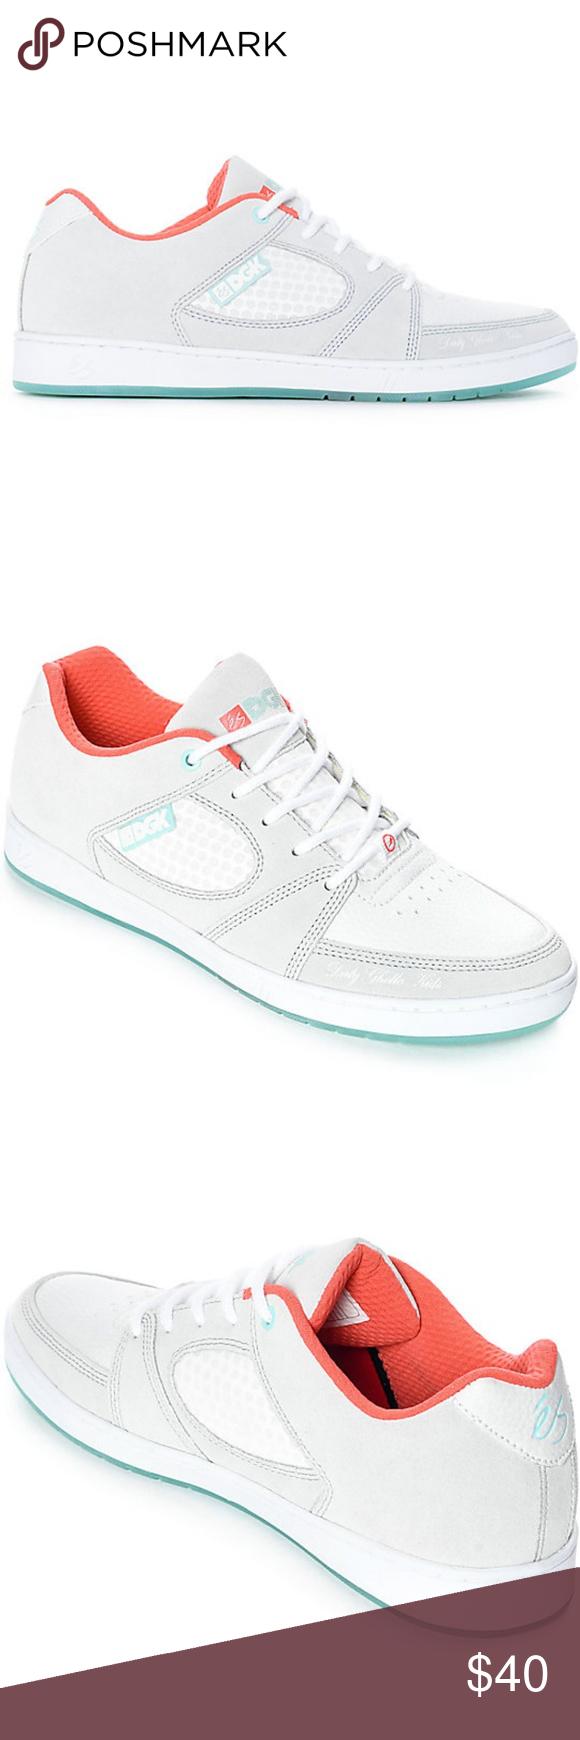 62af5fa043b652 eS x DGK Accel Slim Grey  amp  White Skate Shoes  New no box